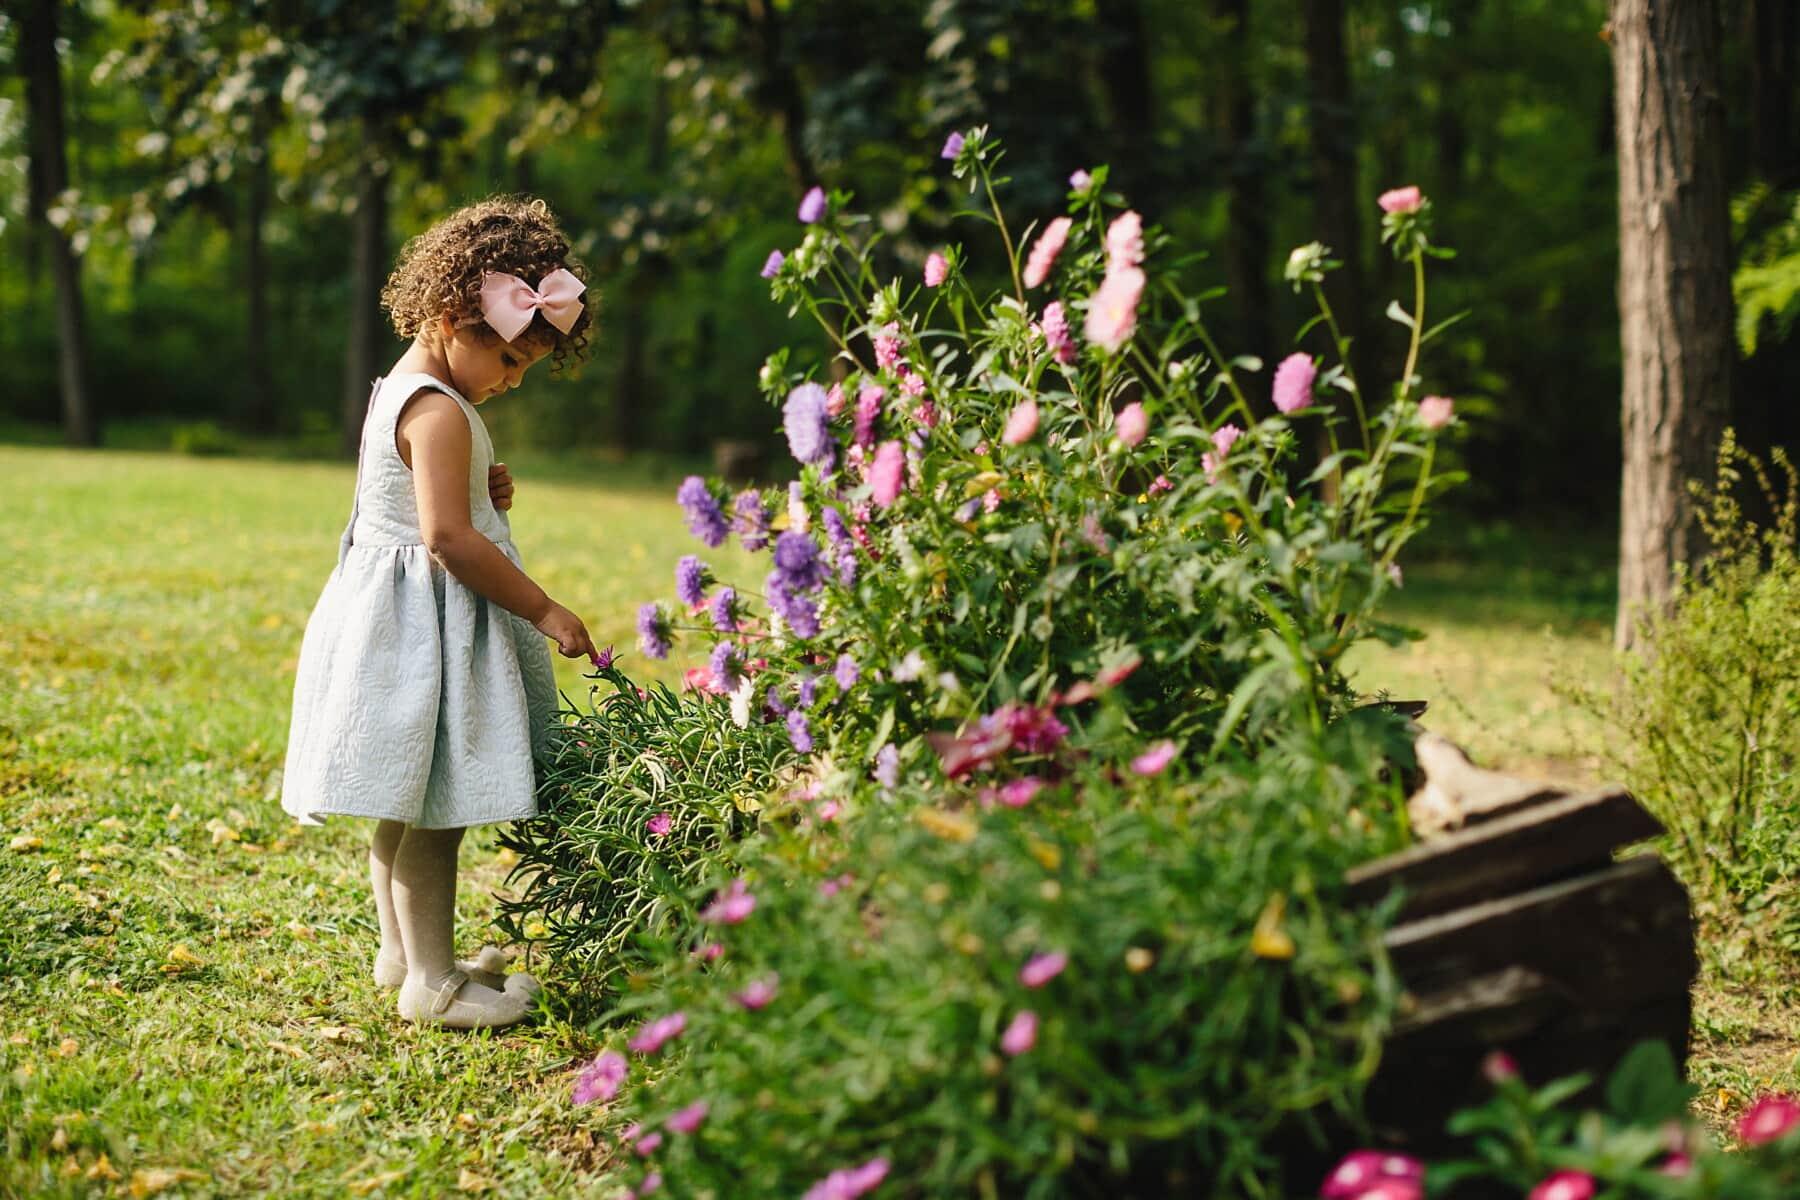 jardin fleuri, adorable, Jolie fille, jeune fille, fantaisie, jeune, enfant, robe, bénéficiant, coiffure